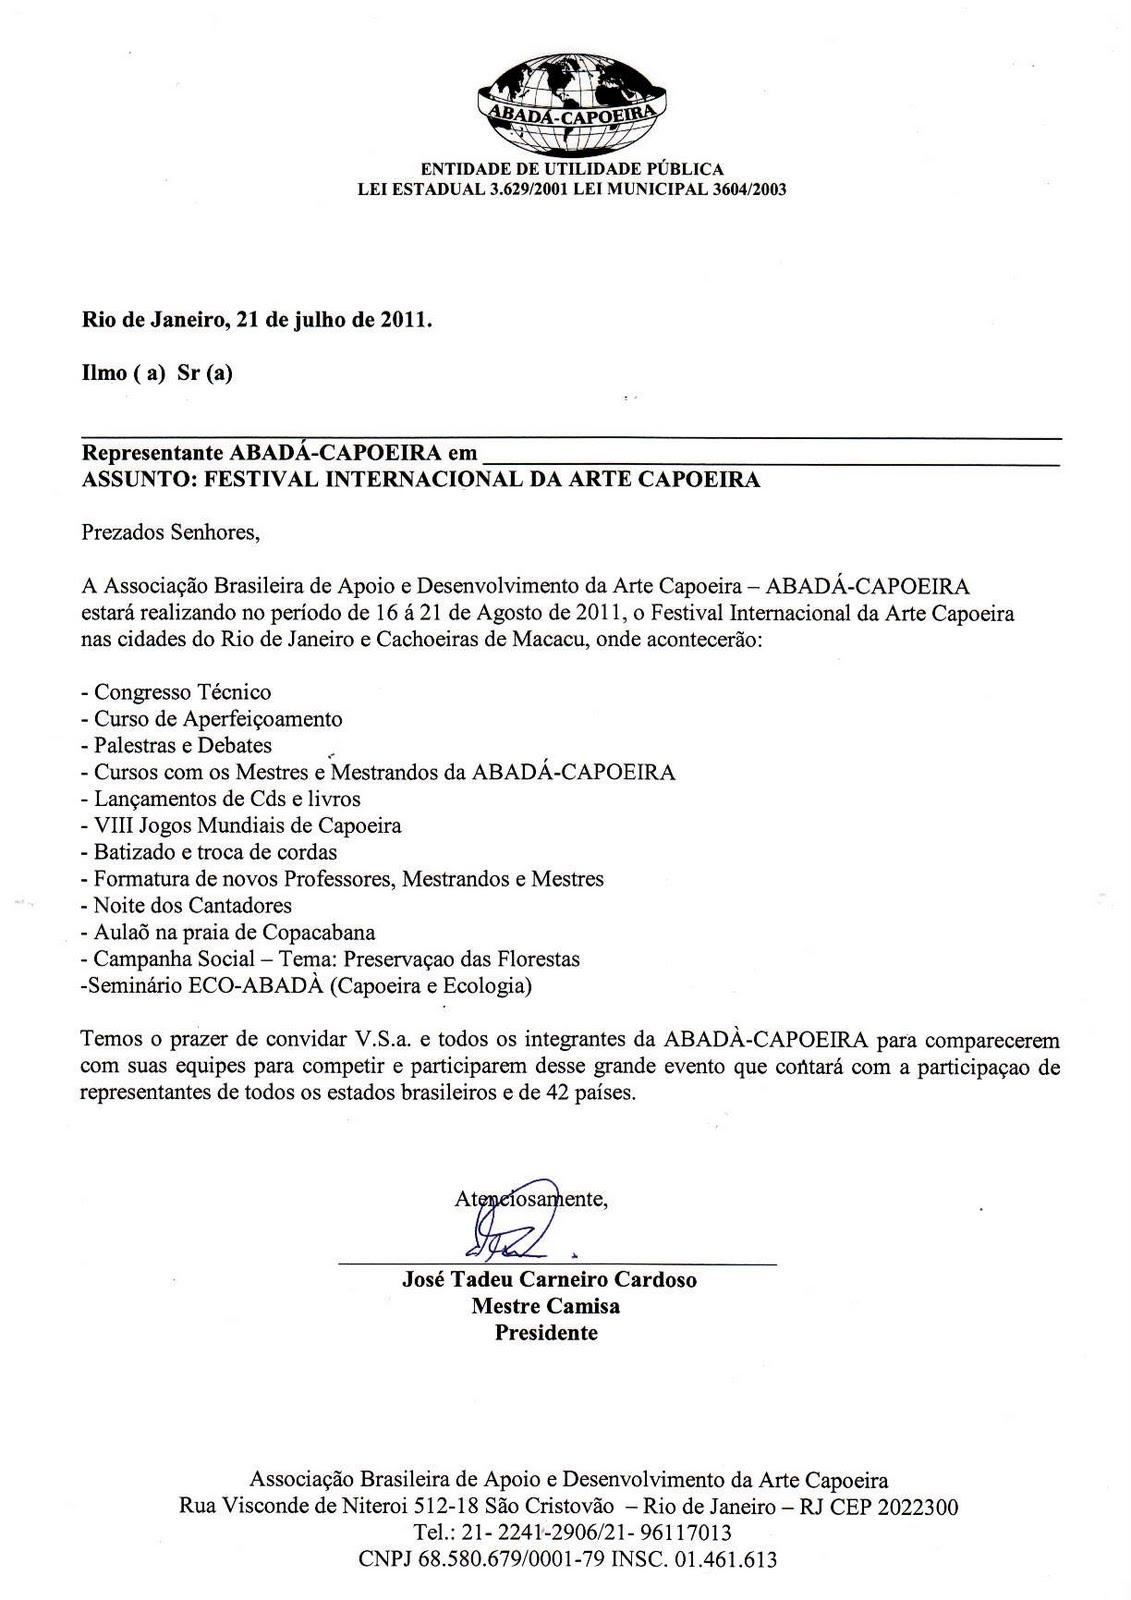 JOGOS MUNDIAIS 2011 – Carta Convite